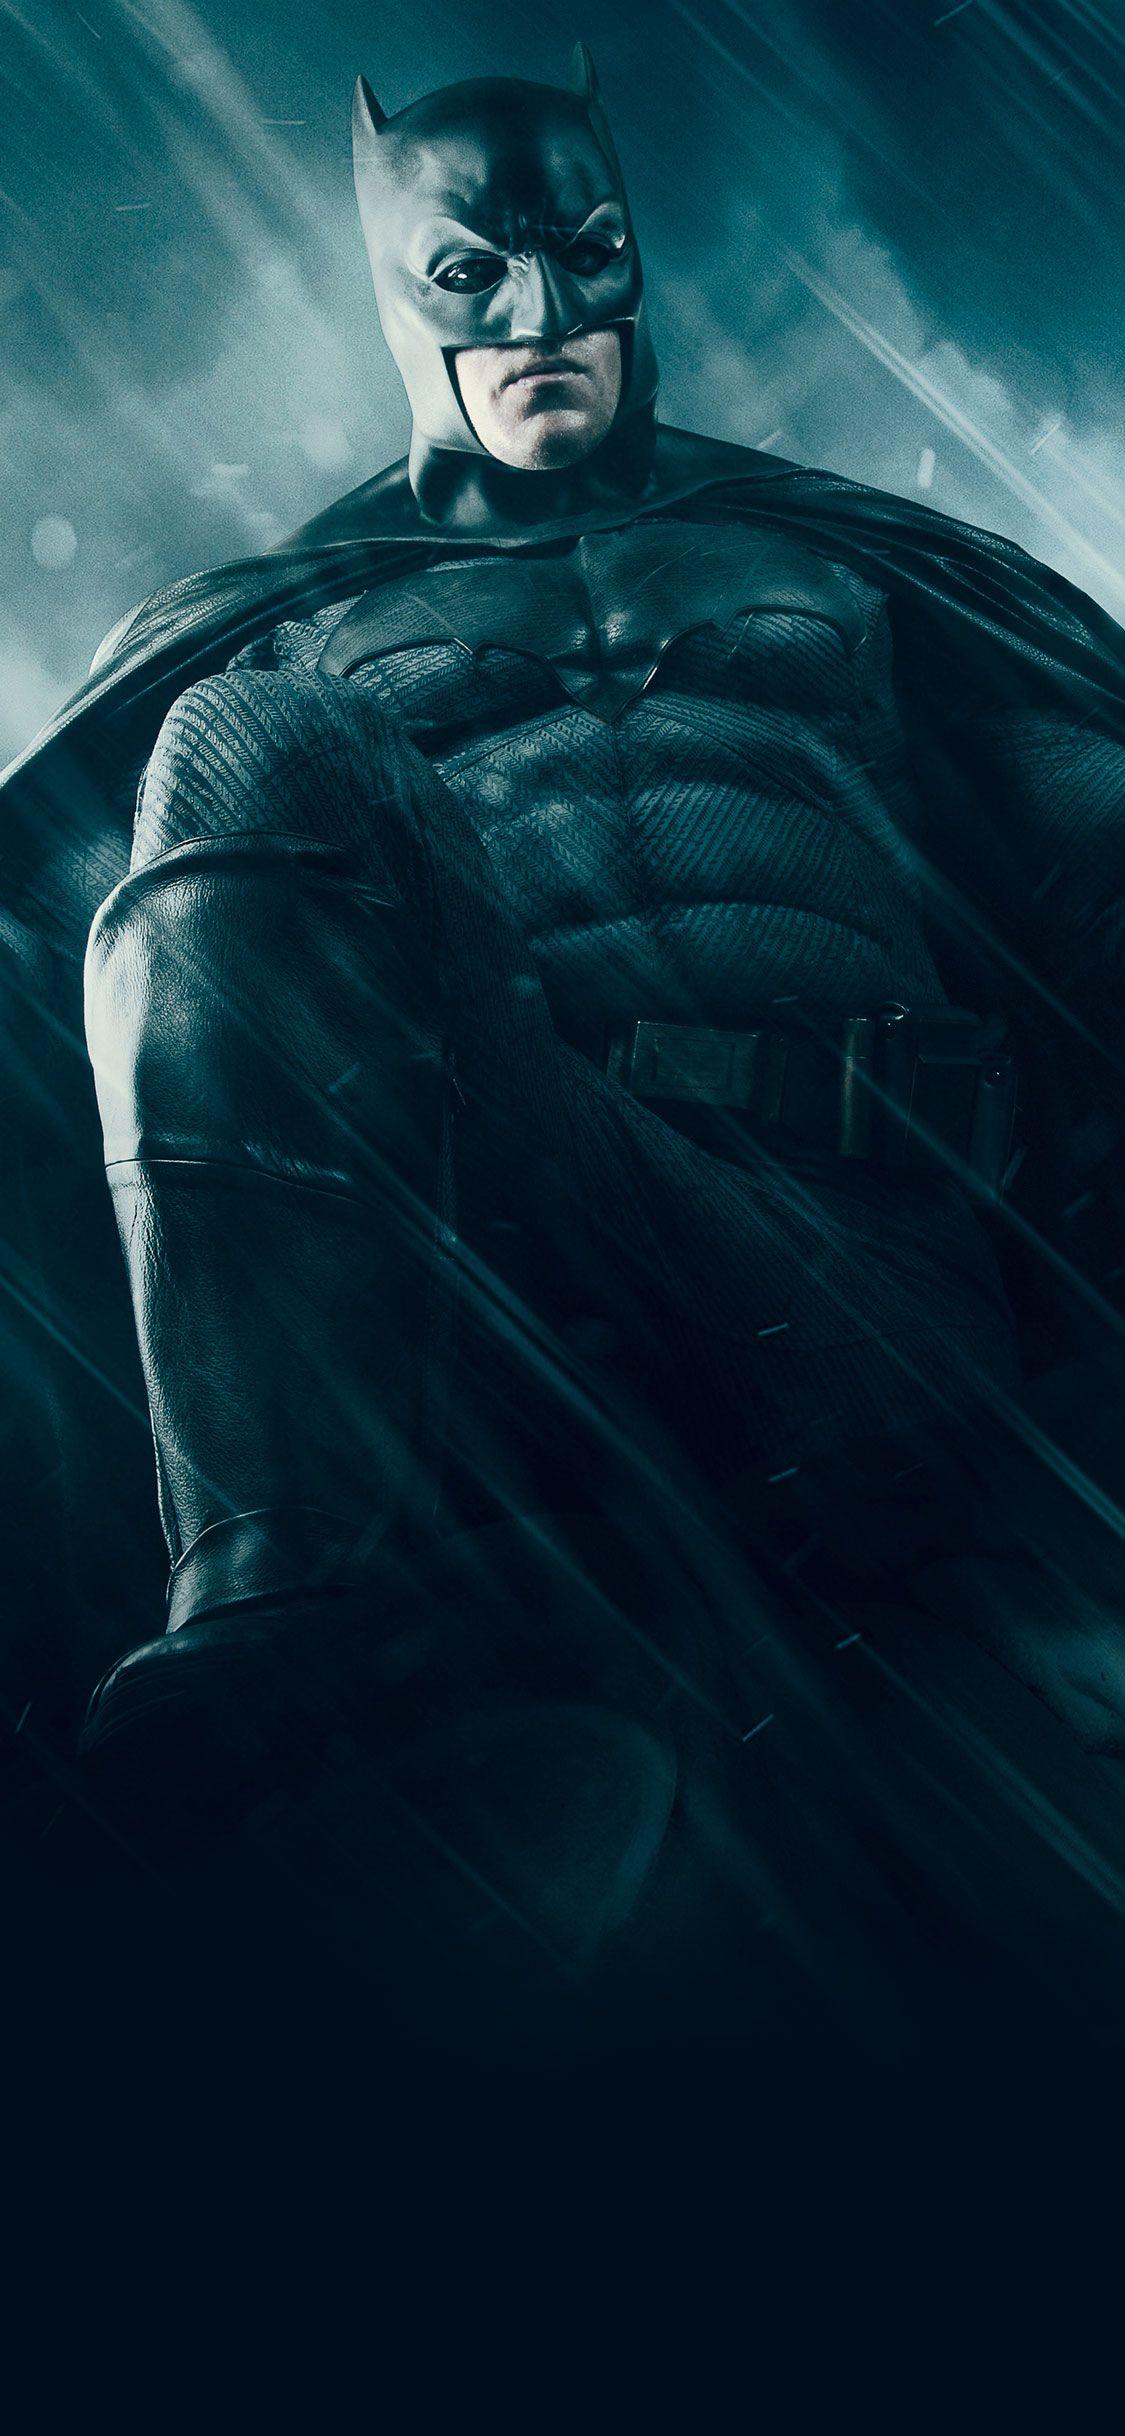 Batman 4k Android Wallpapers - Wallpaper Cave